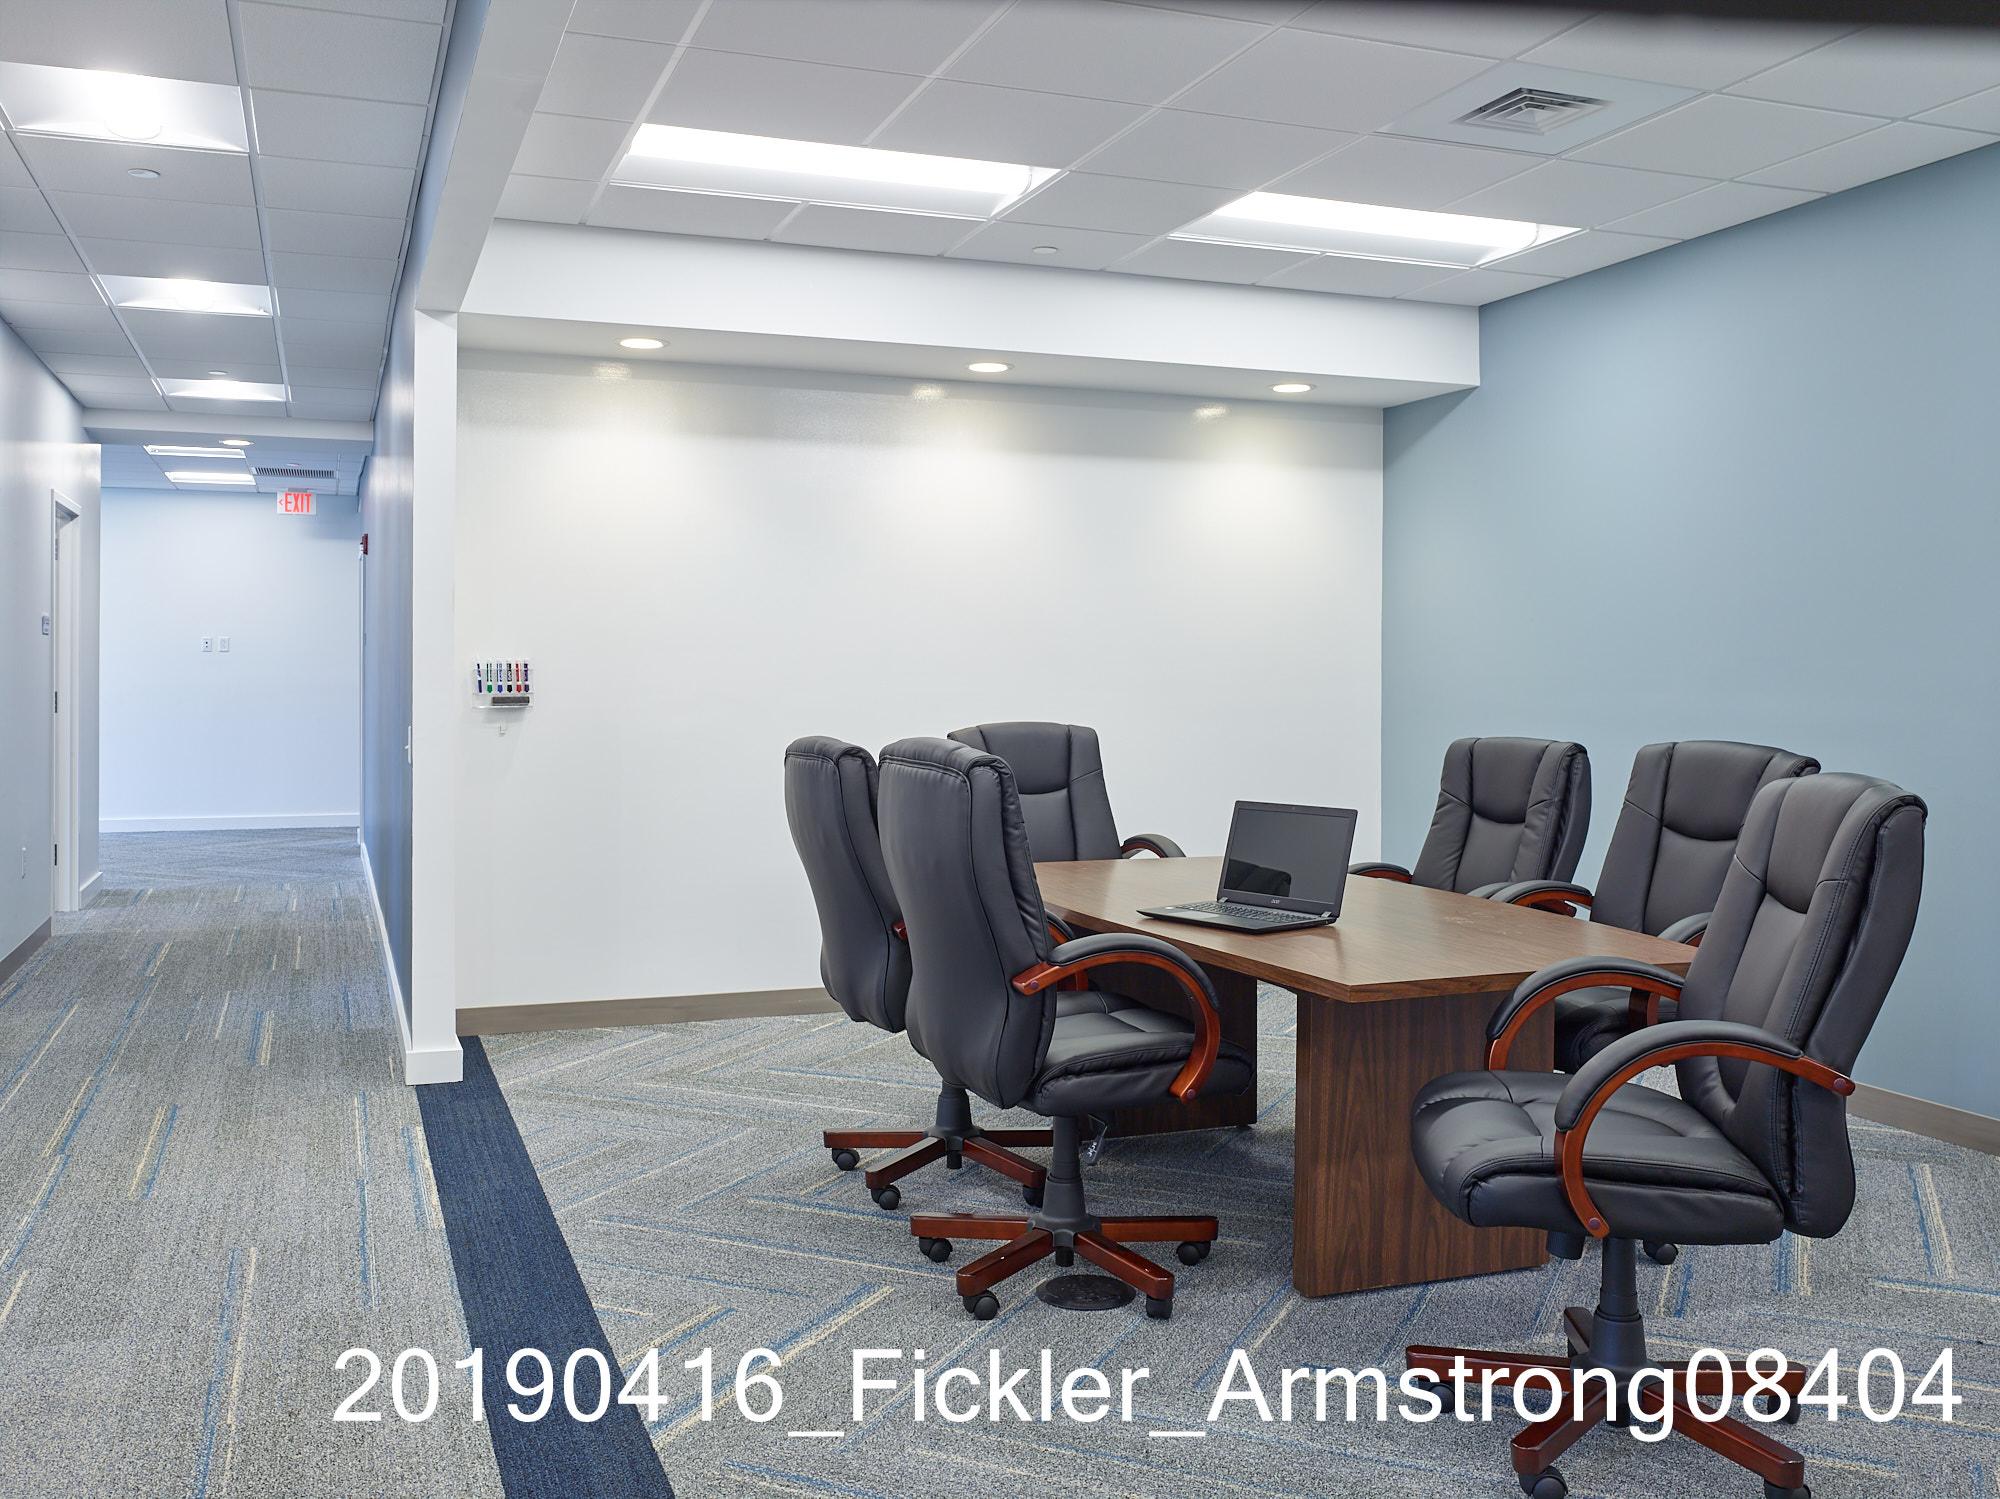 20190416_Fickler_Armstrong08404.jpg